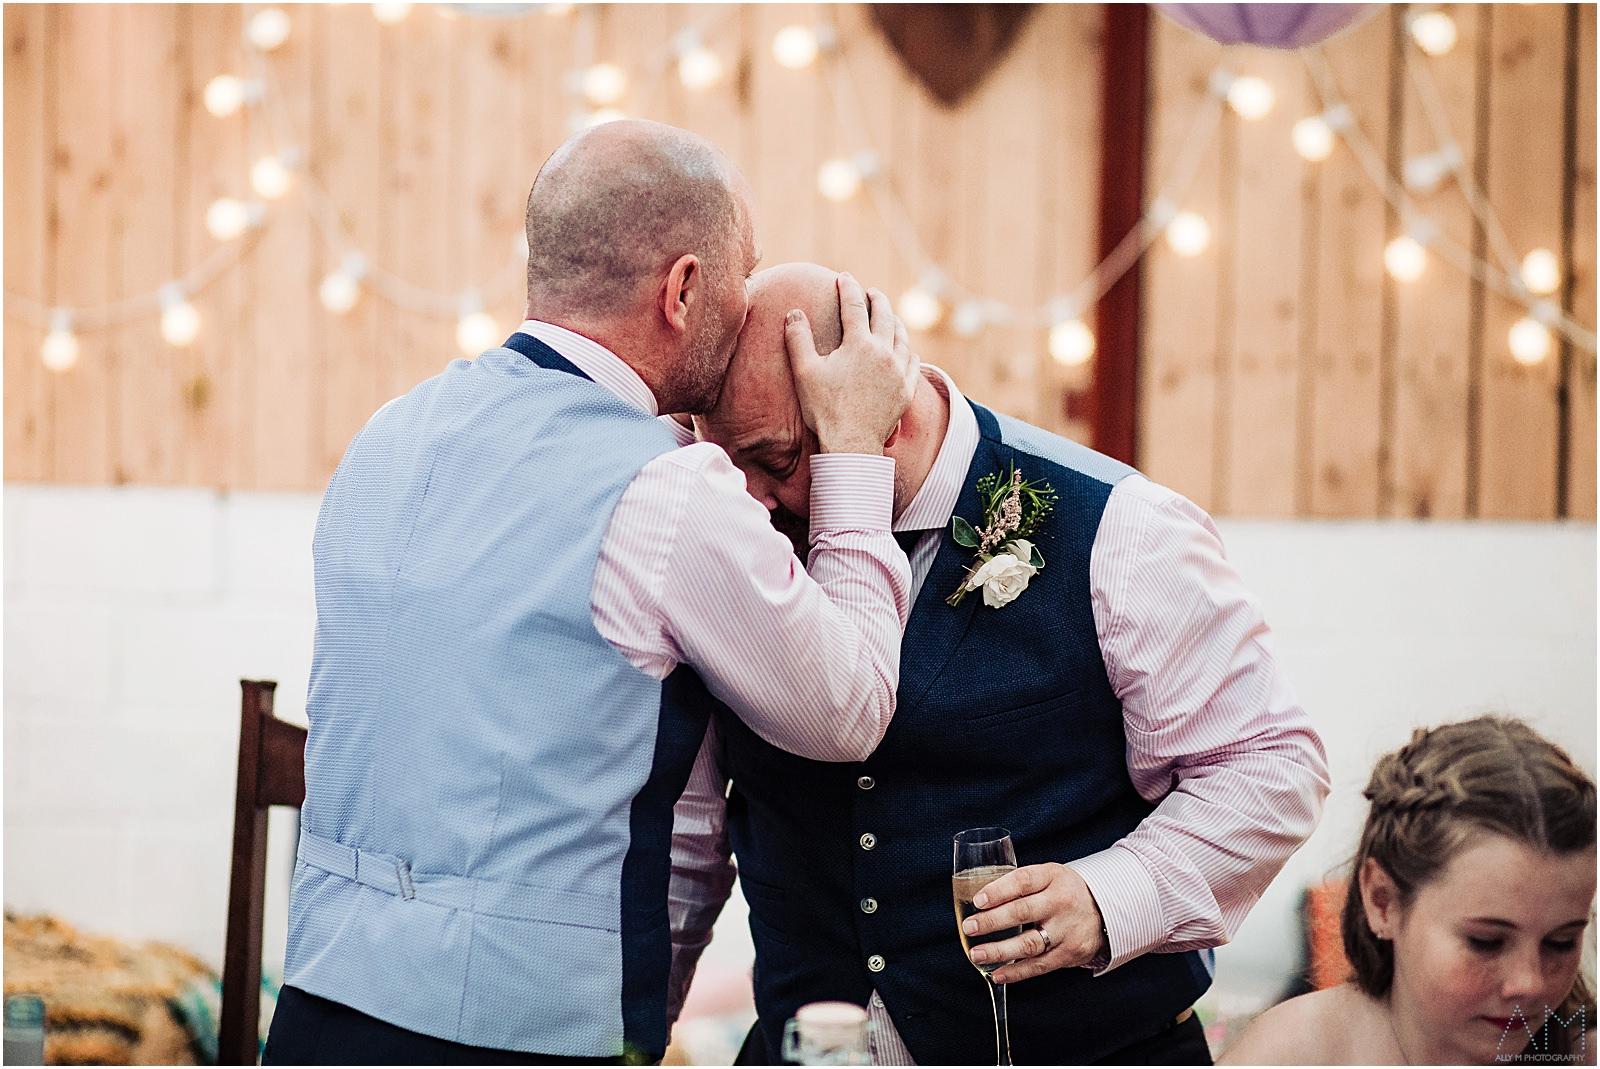 Groom kissing best man on the head